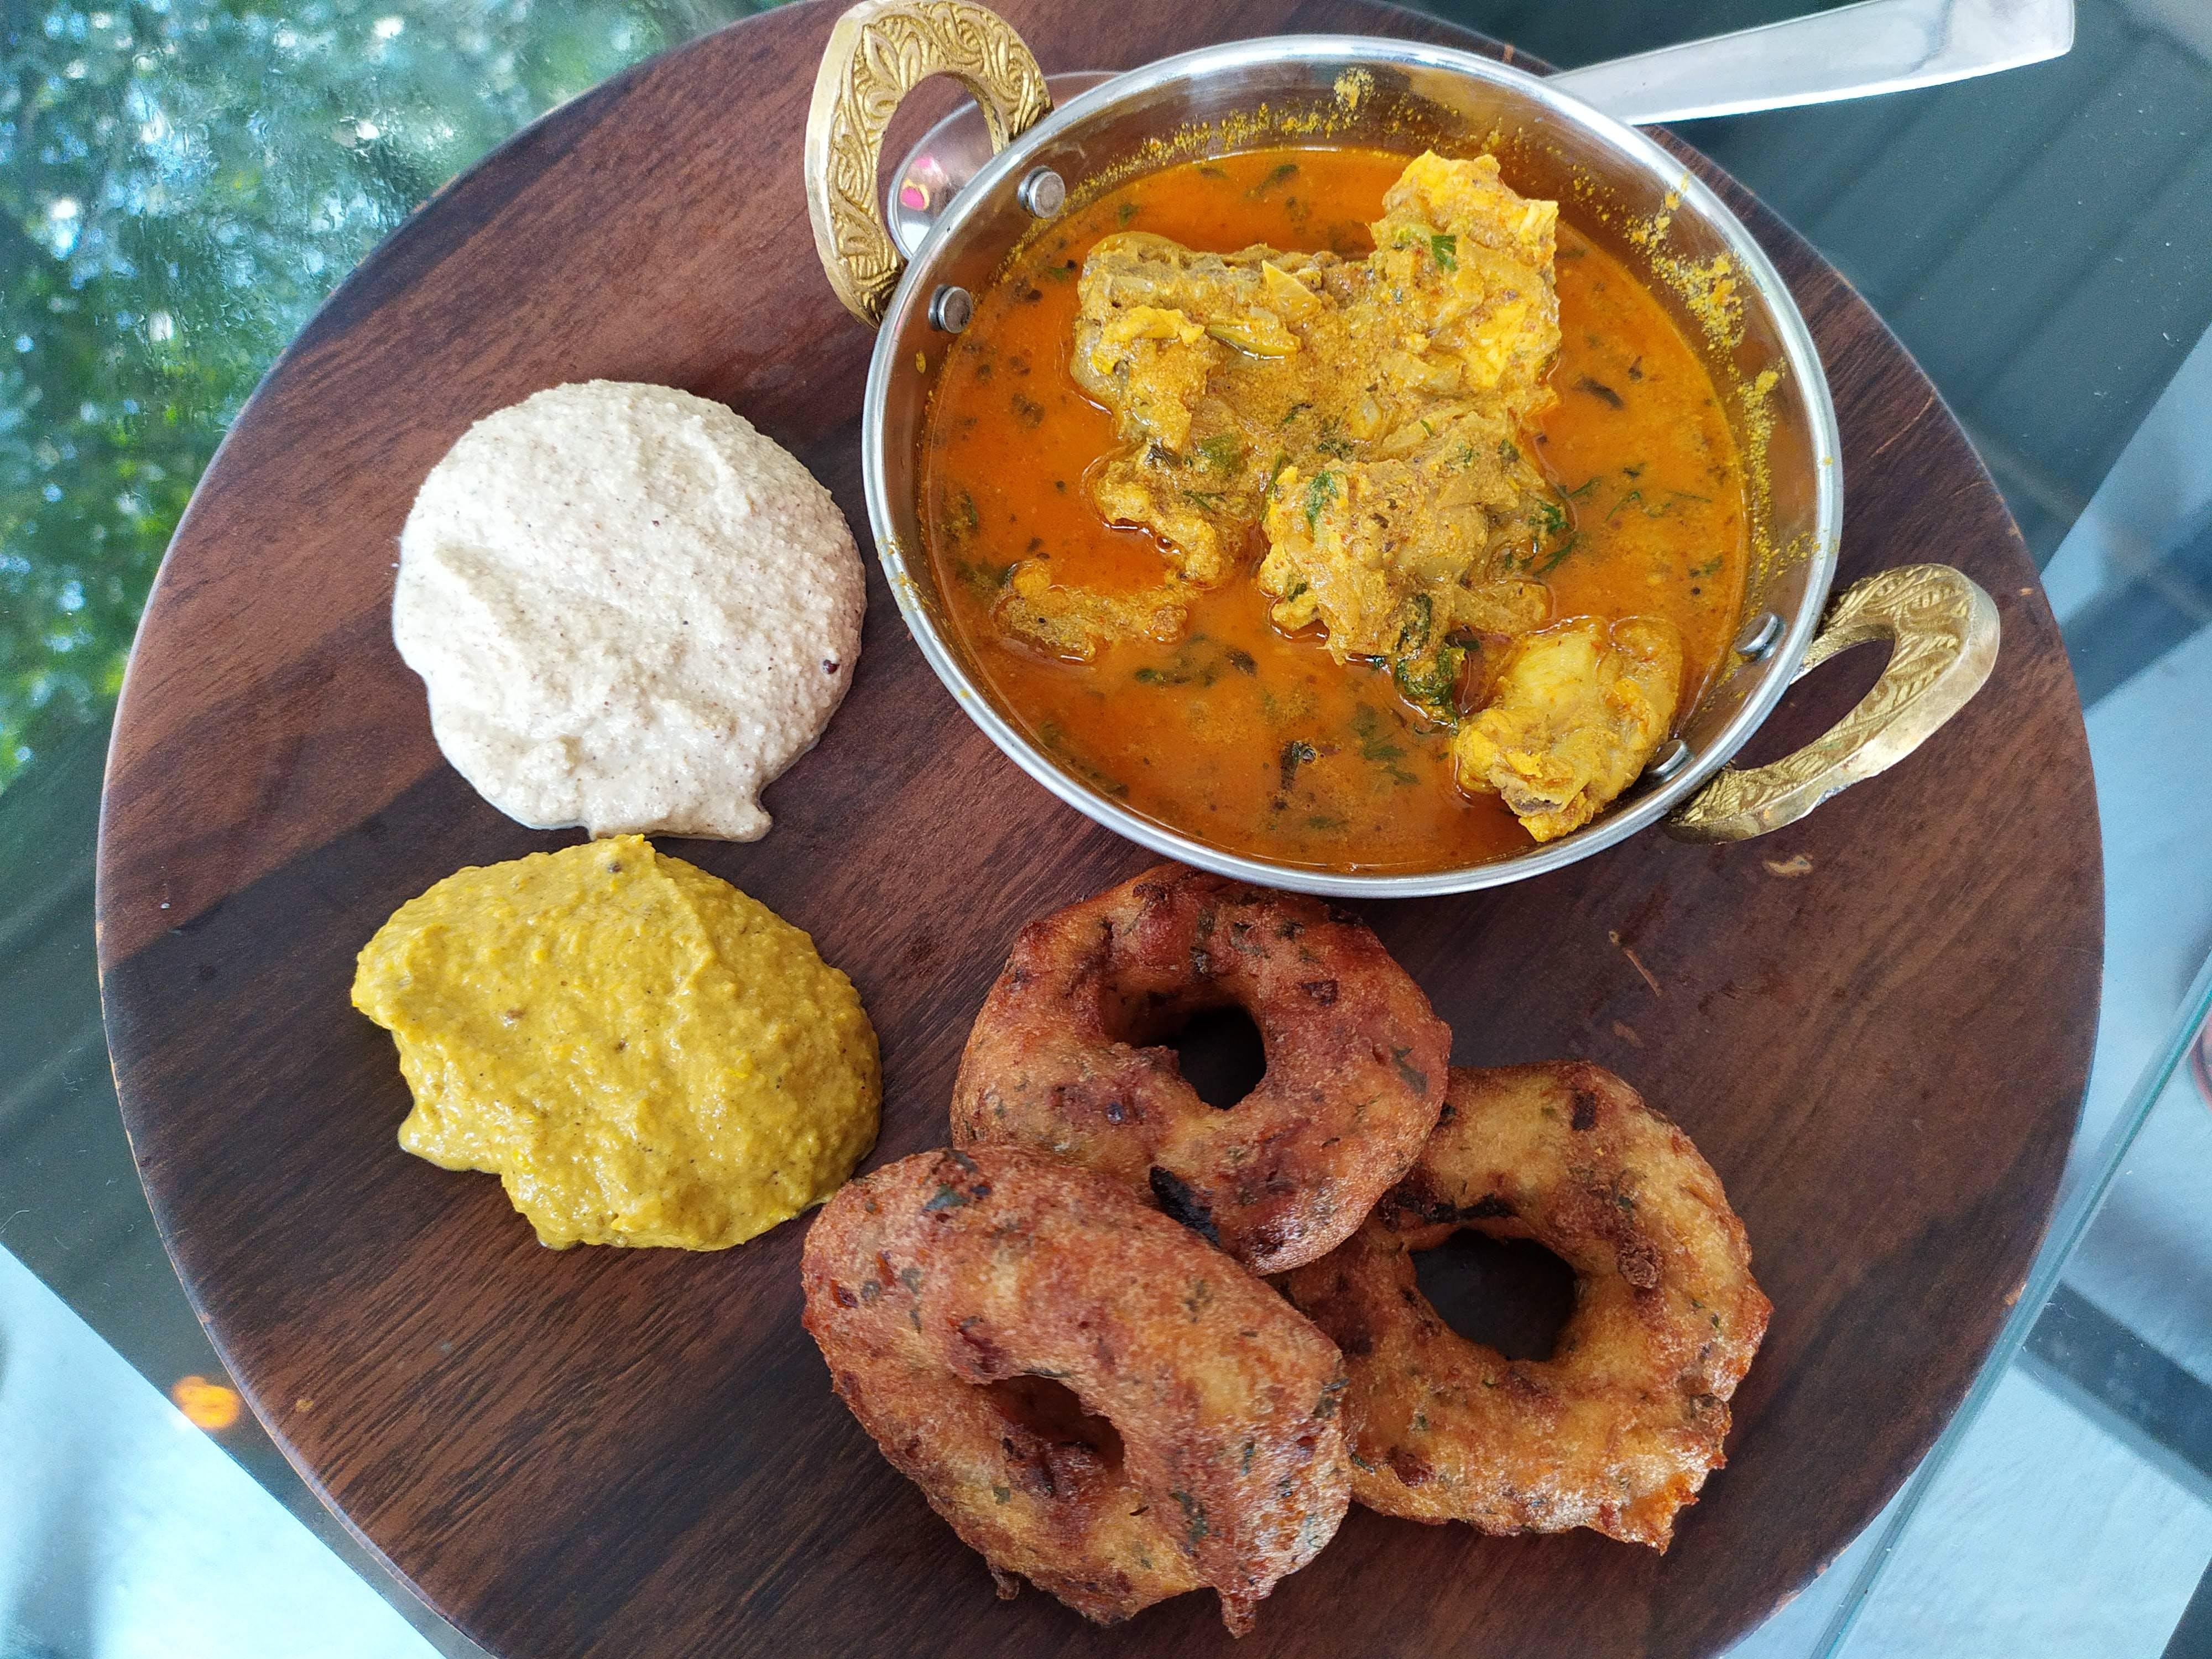 Dish,Food,Cuisine,Ingredient,Fried food,Produce,Staple food,Indian cuisine,Side dish,Vegetarian food